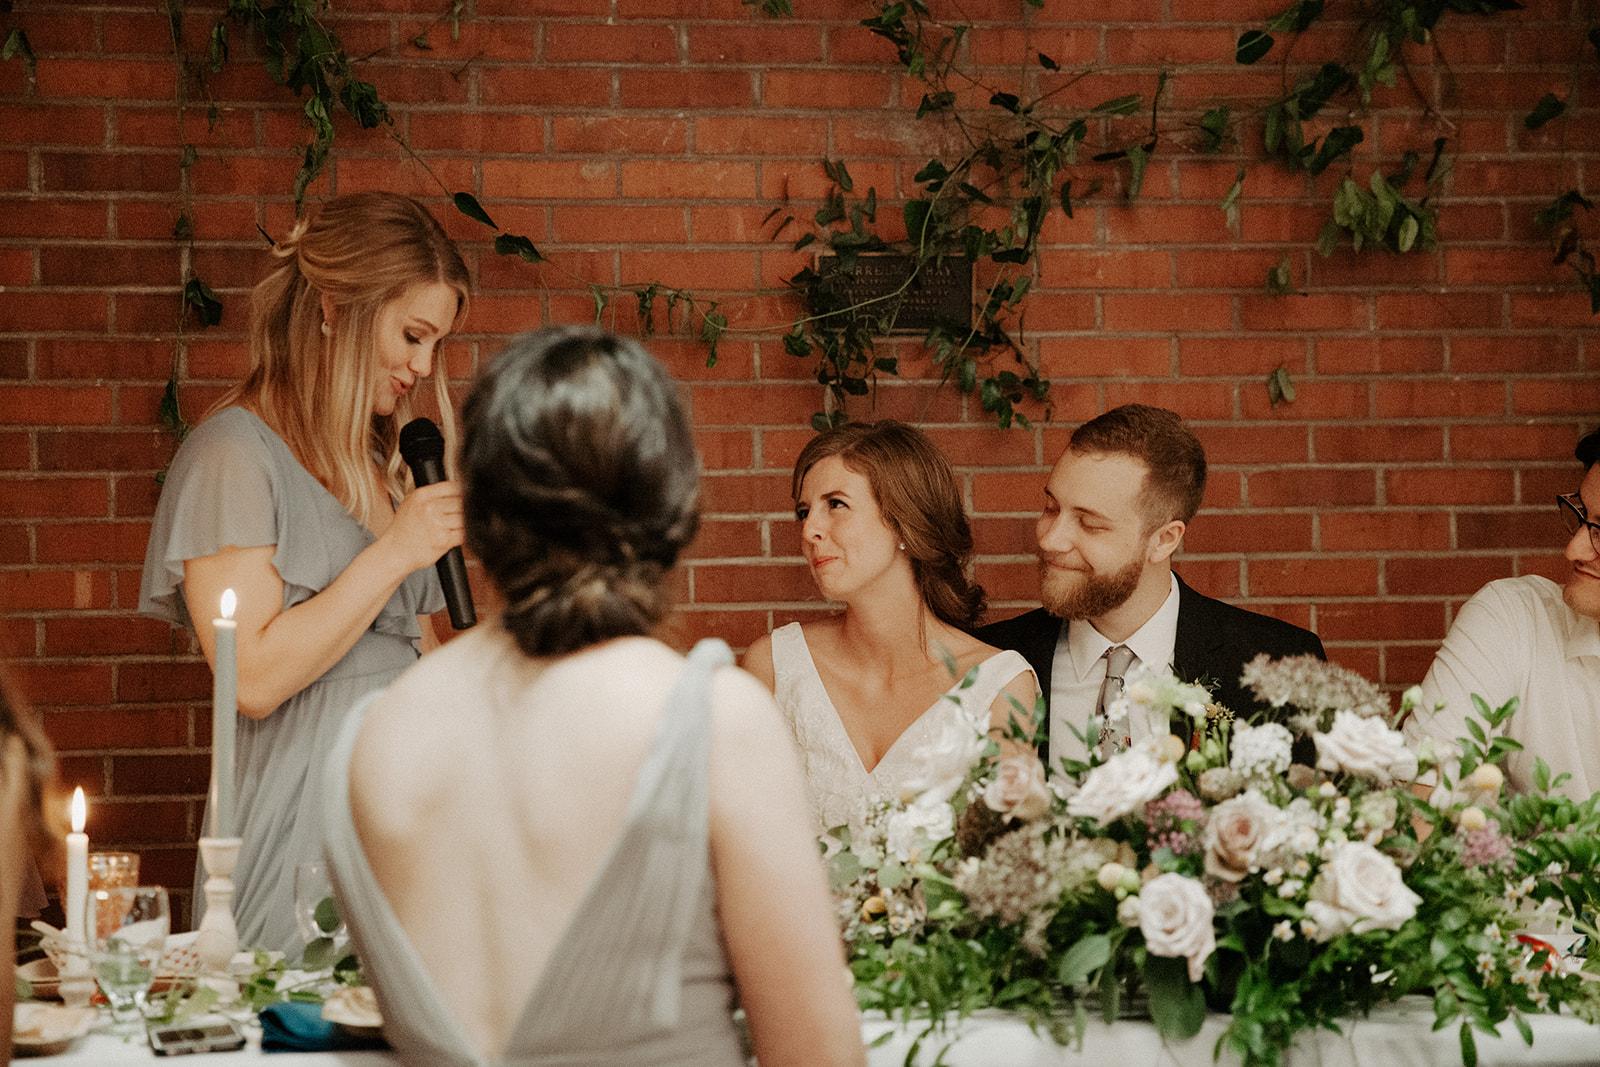 camp_wokanda_peoria_illinois_wedding_photographer_wright_photographs_bliese_0954.jpg